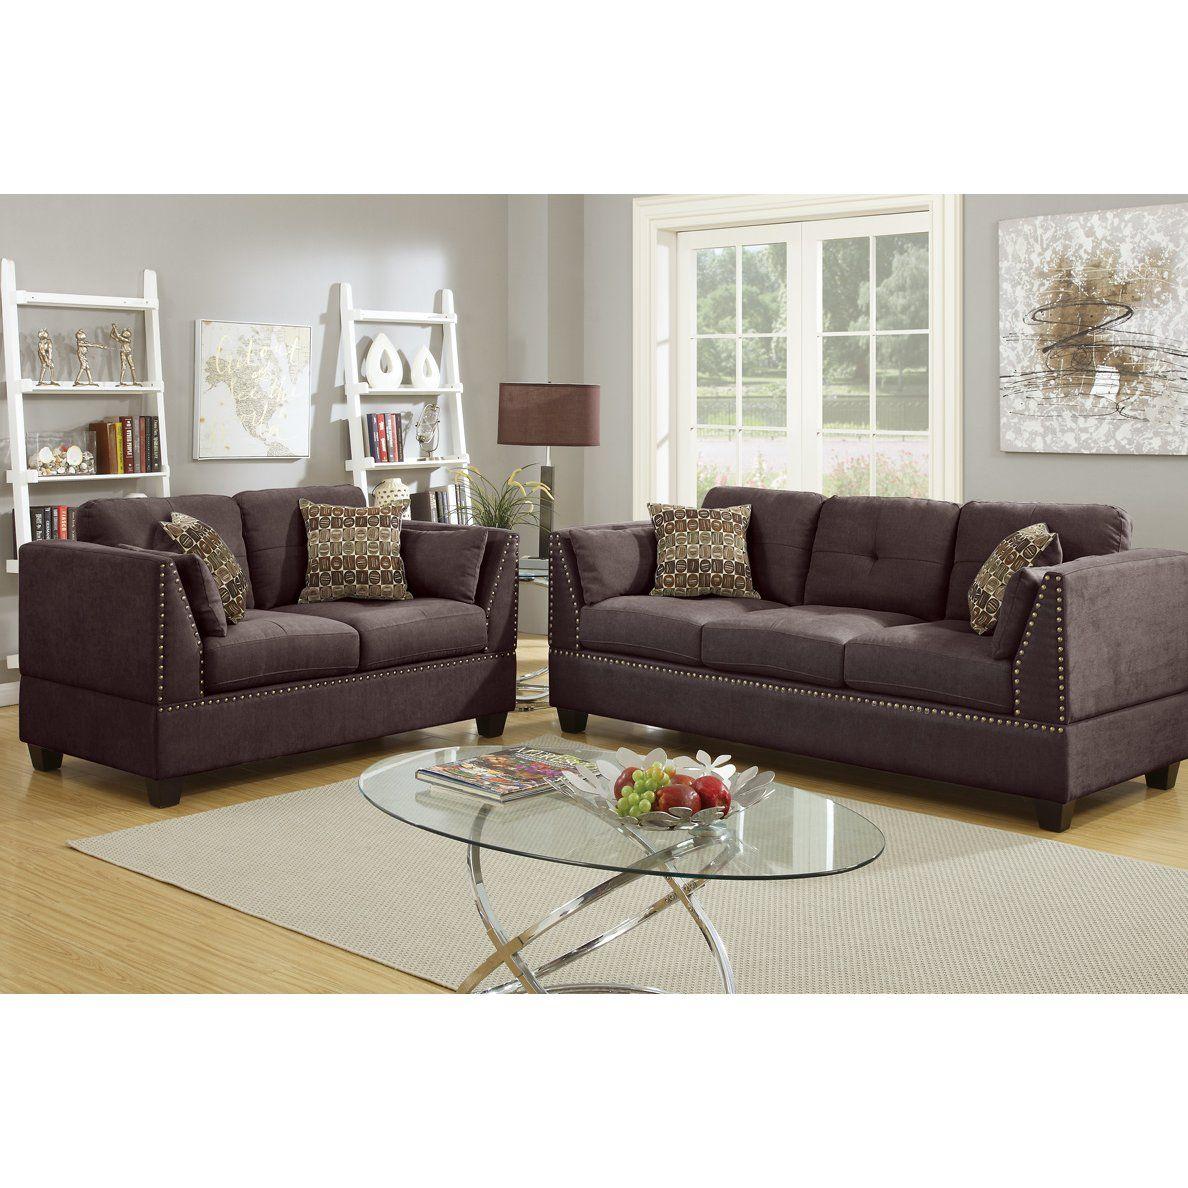 Bobkona Sectional Sofa Embly Instructions Alex Bed Sleeper Zenda 2 Piece Living Room Set Sets